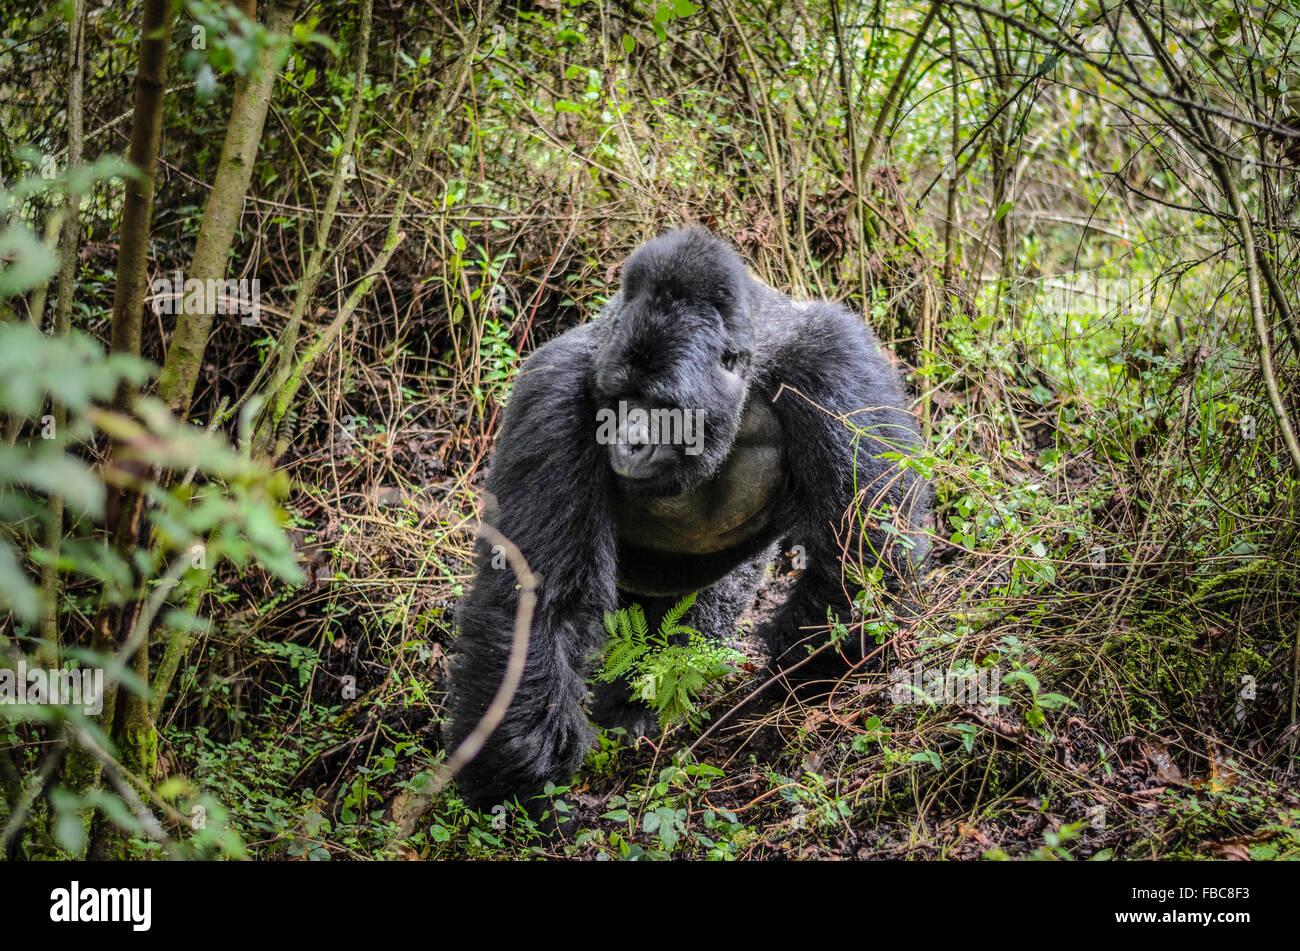 Dos argenté, Gorille de montagne, Mgahinga Gorilla National Park, de l'Ouganda Photo Stock